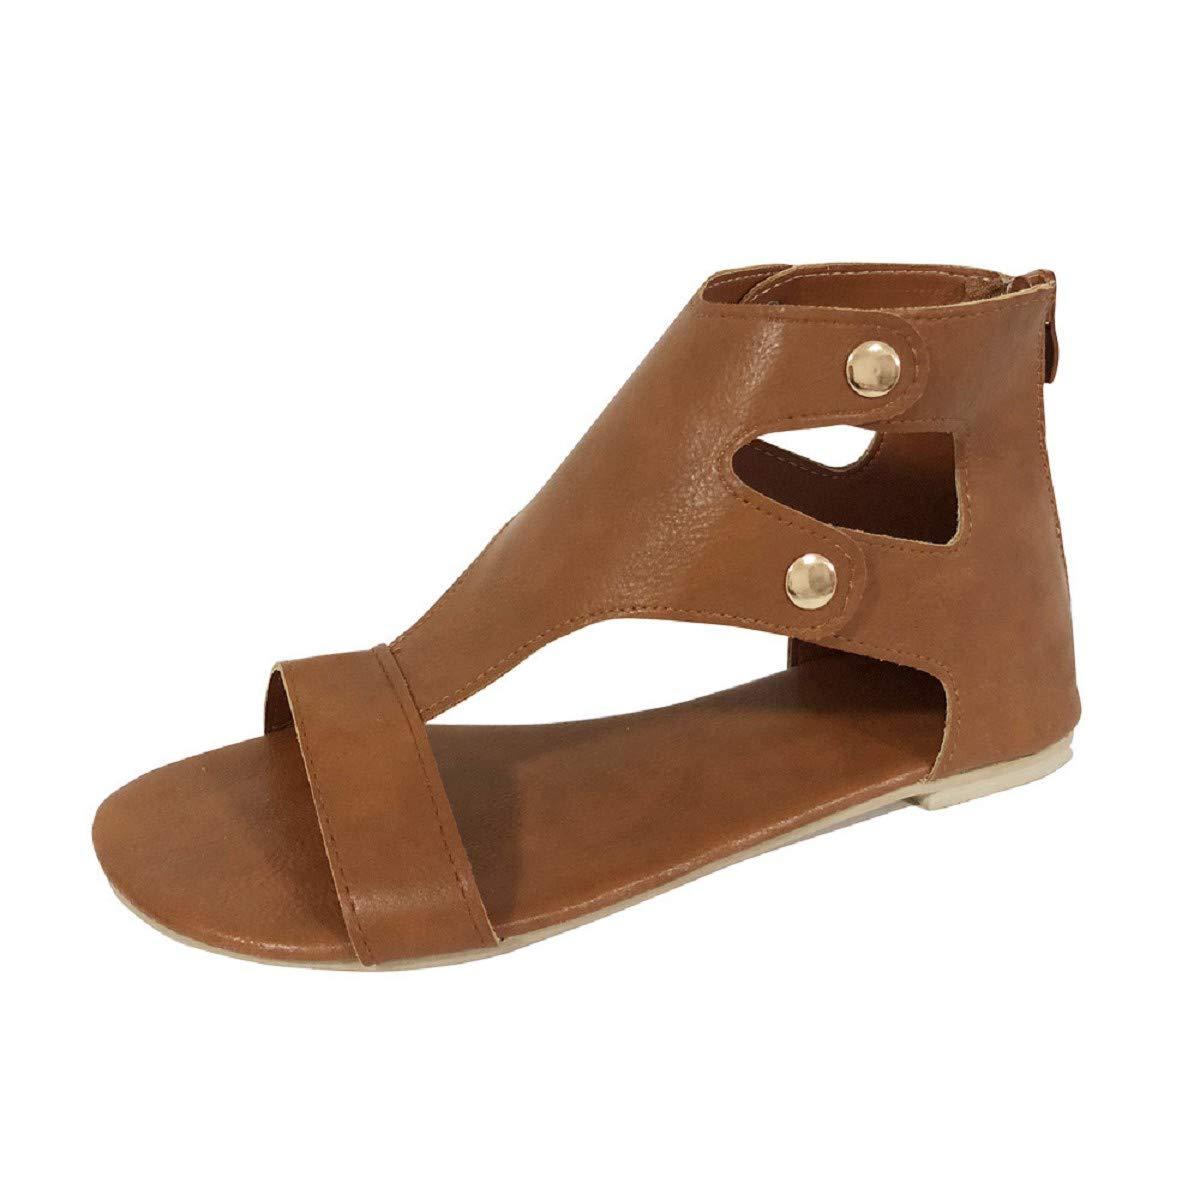 OTINICE Women Flat Sandals Summer Rivet Open Toe Hollow Breathable Roman Casual Shoes Coffee